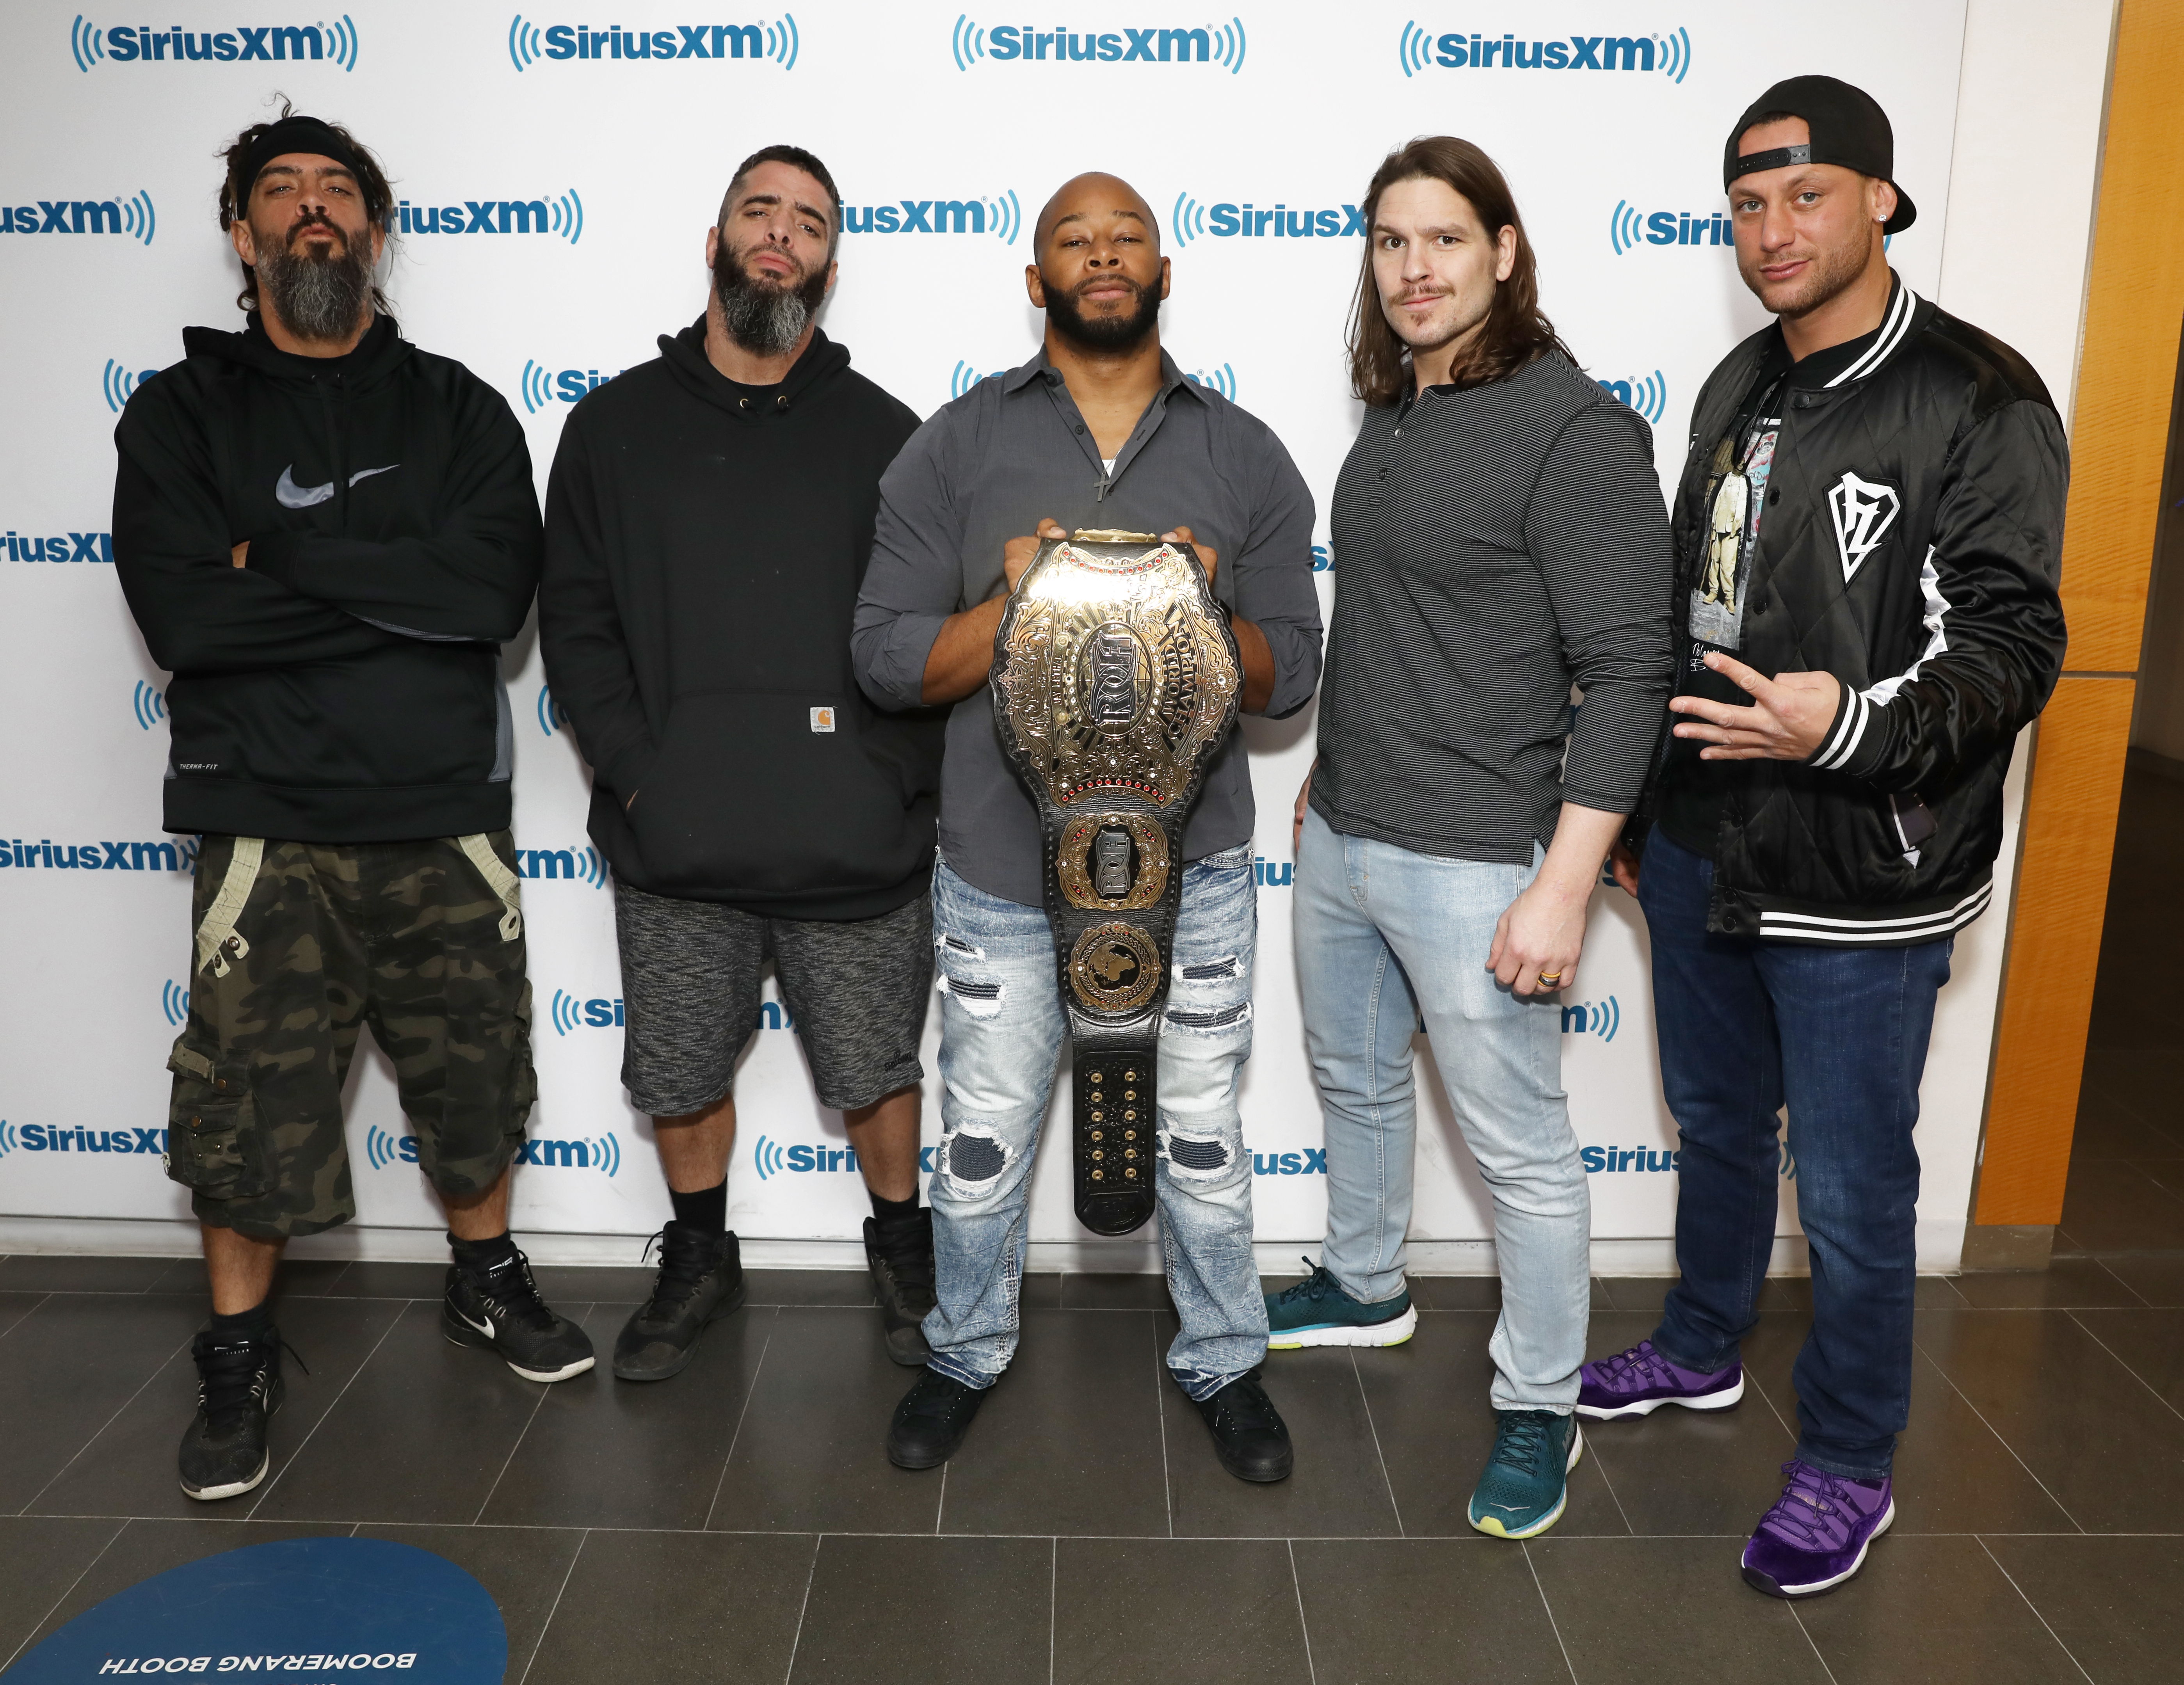 Celebrities Visit SiriusXM - April 4, 2019